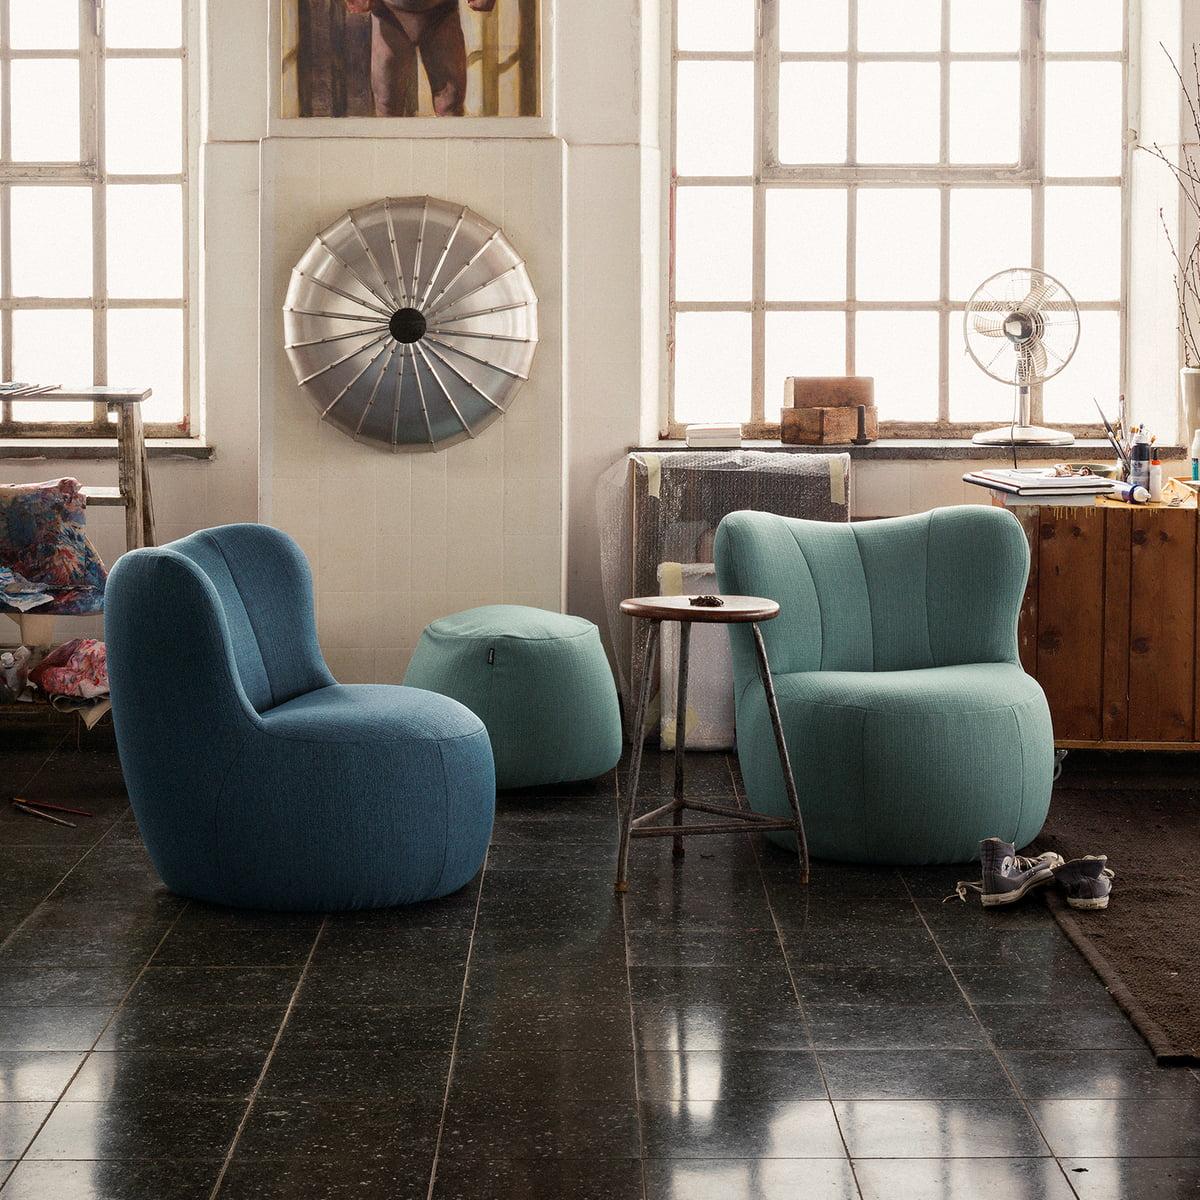 173 armchair by freistil connox. Black Bedroom Furniture Sets. Home Design Ideas